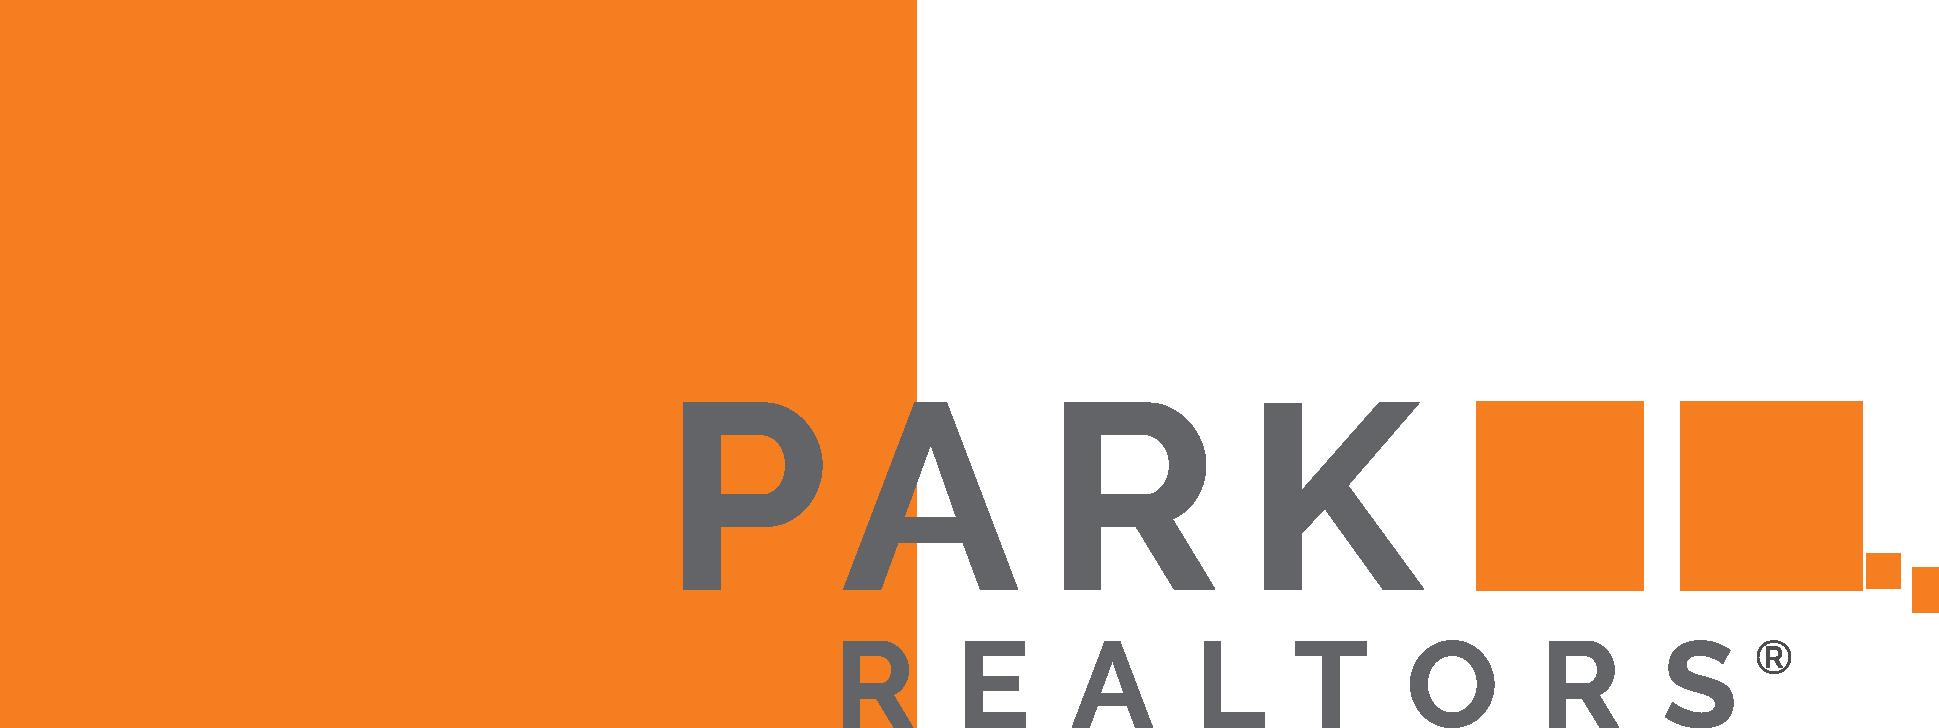 park co realtors logo